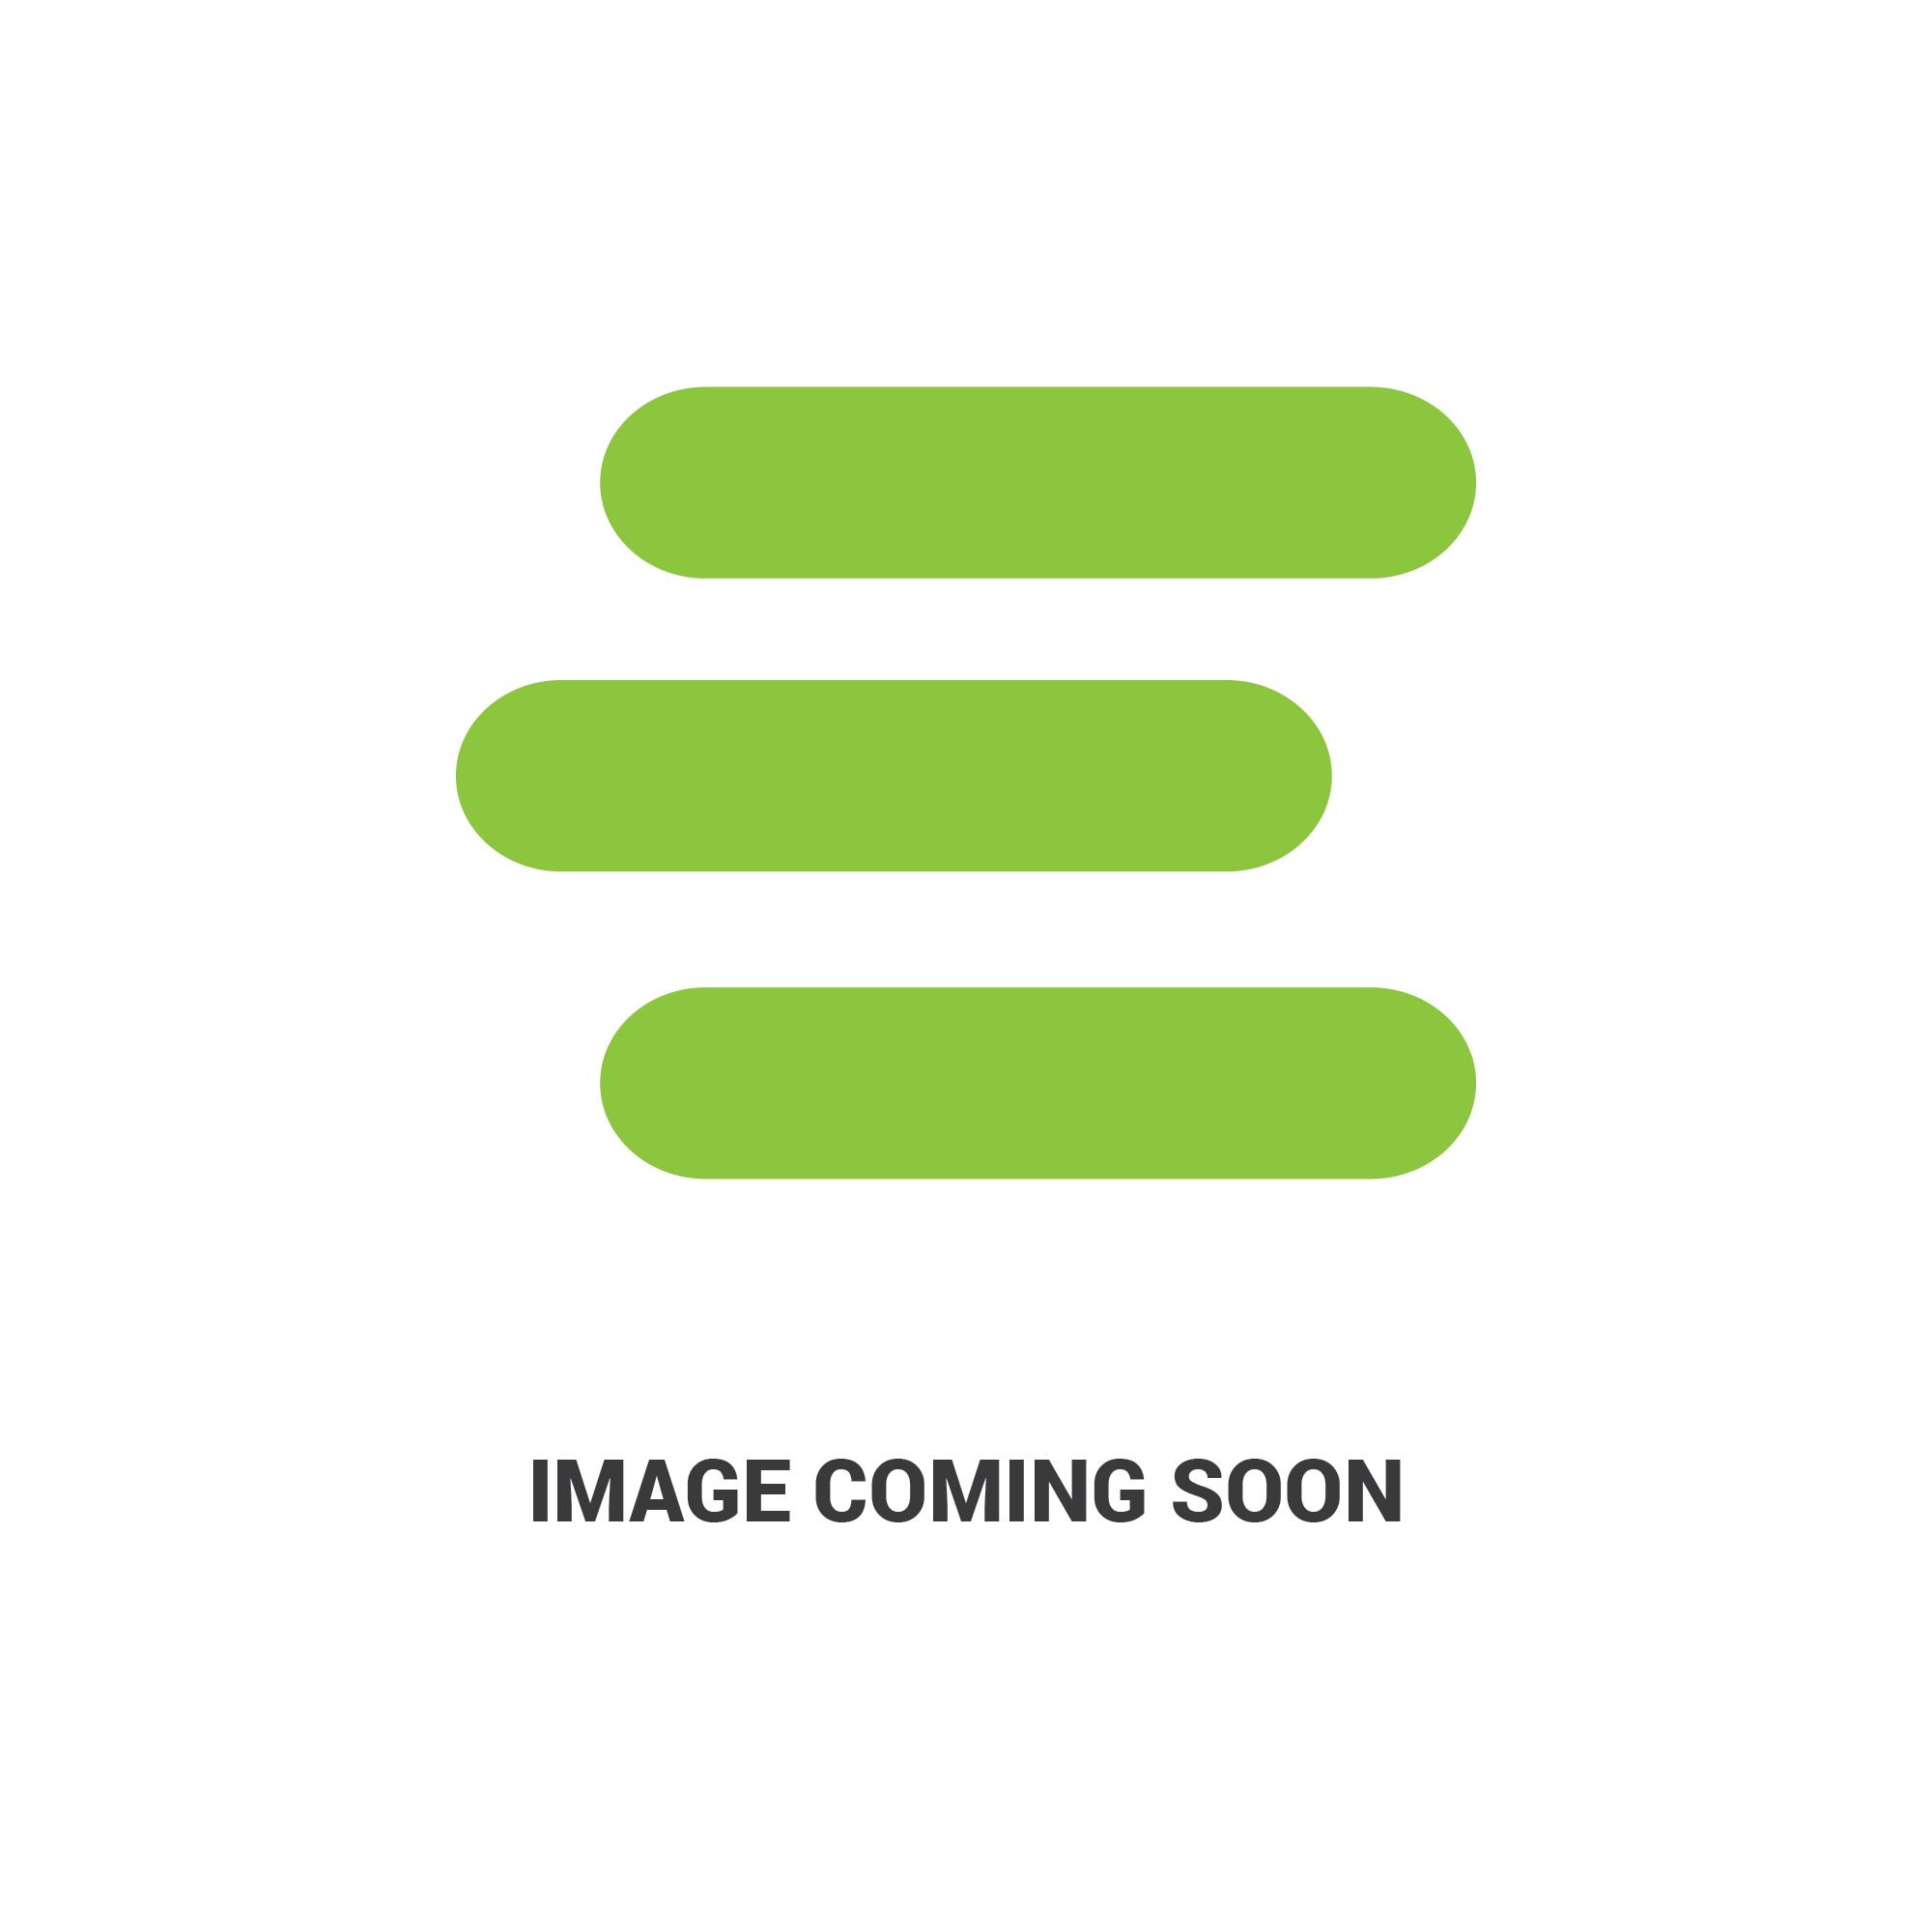 E-R105248ag1001680.2.jpg